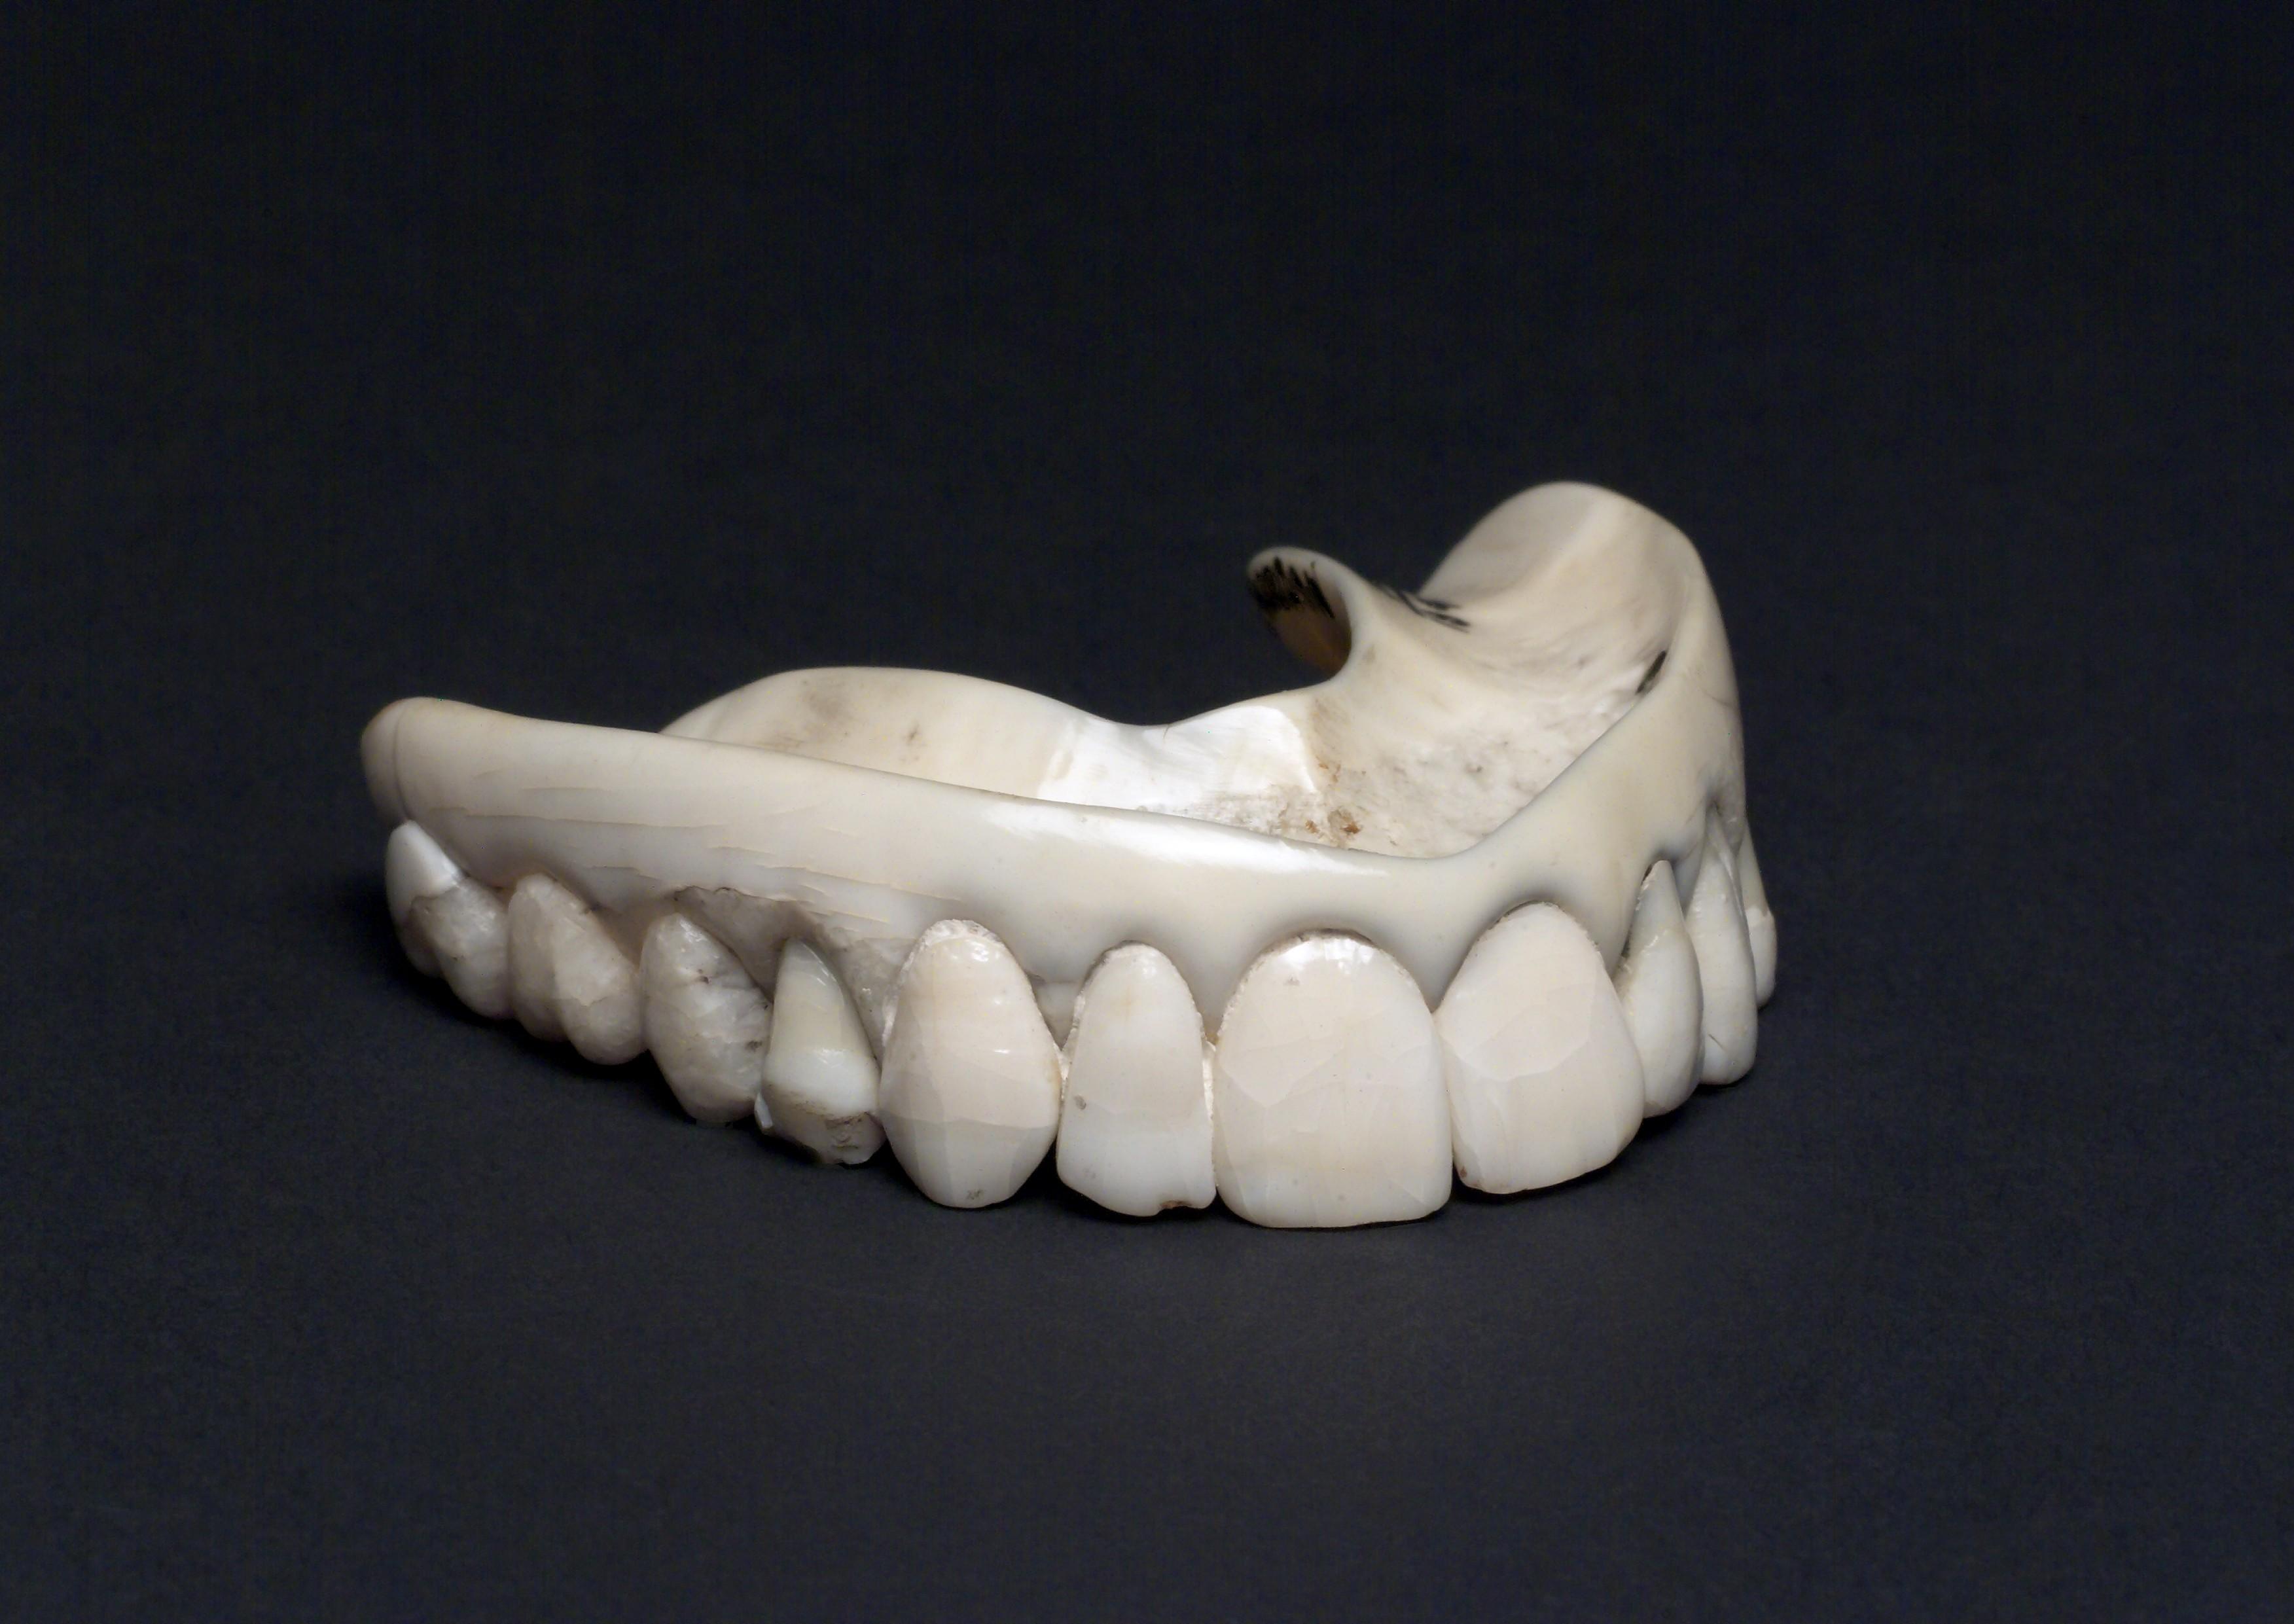 Fileupper Ivory Denture With Human Teeth England 1801 1860